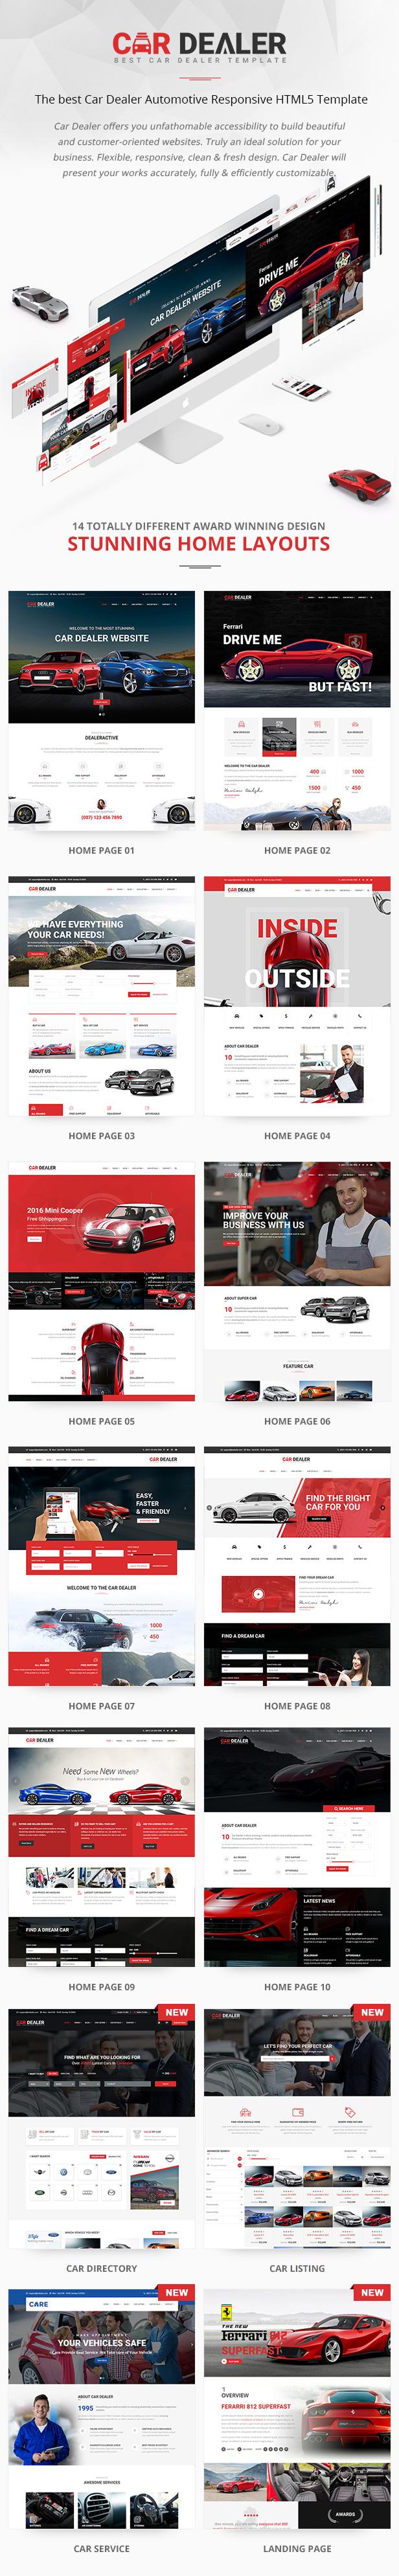 Car Dealer - Automotive Responsive HTML5 Template - 4